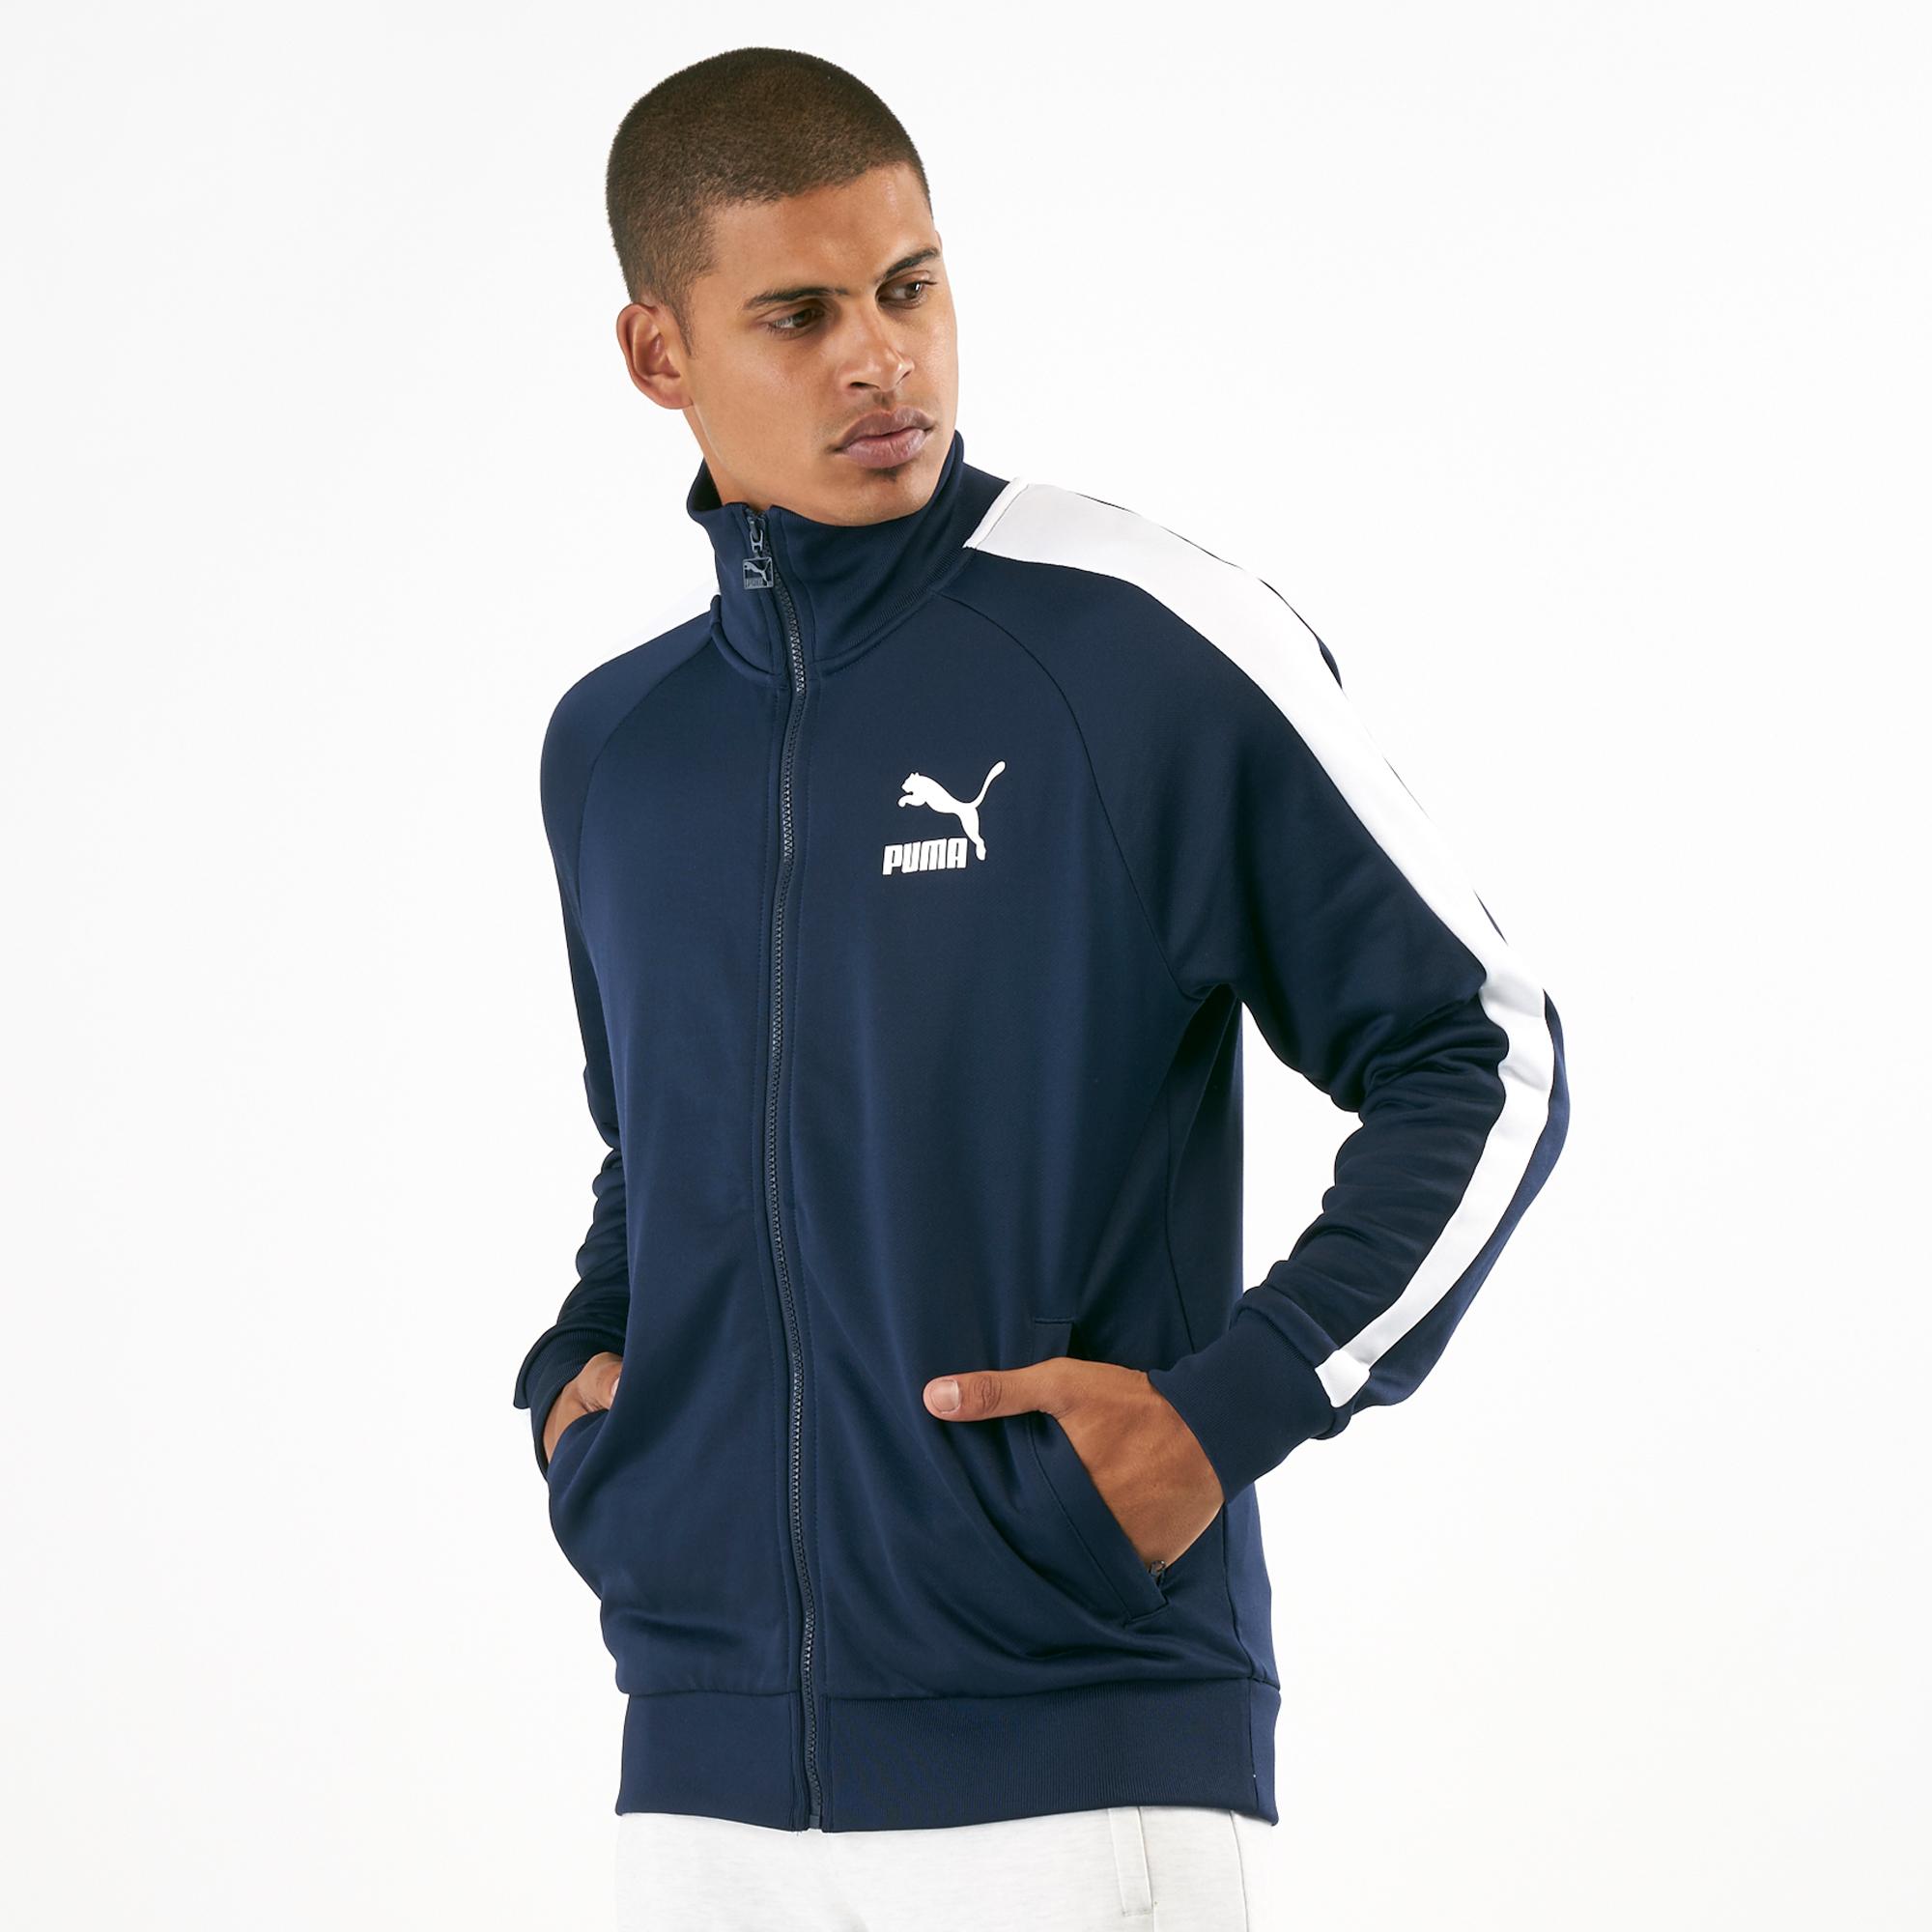 PUMA Mens Iconic T7 Track Jacket PT Track /& Active Jackets